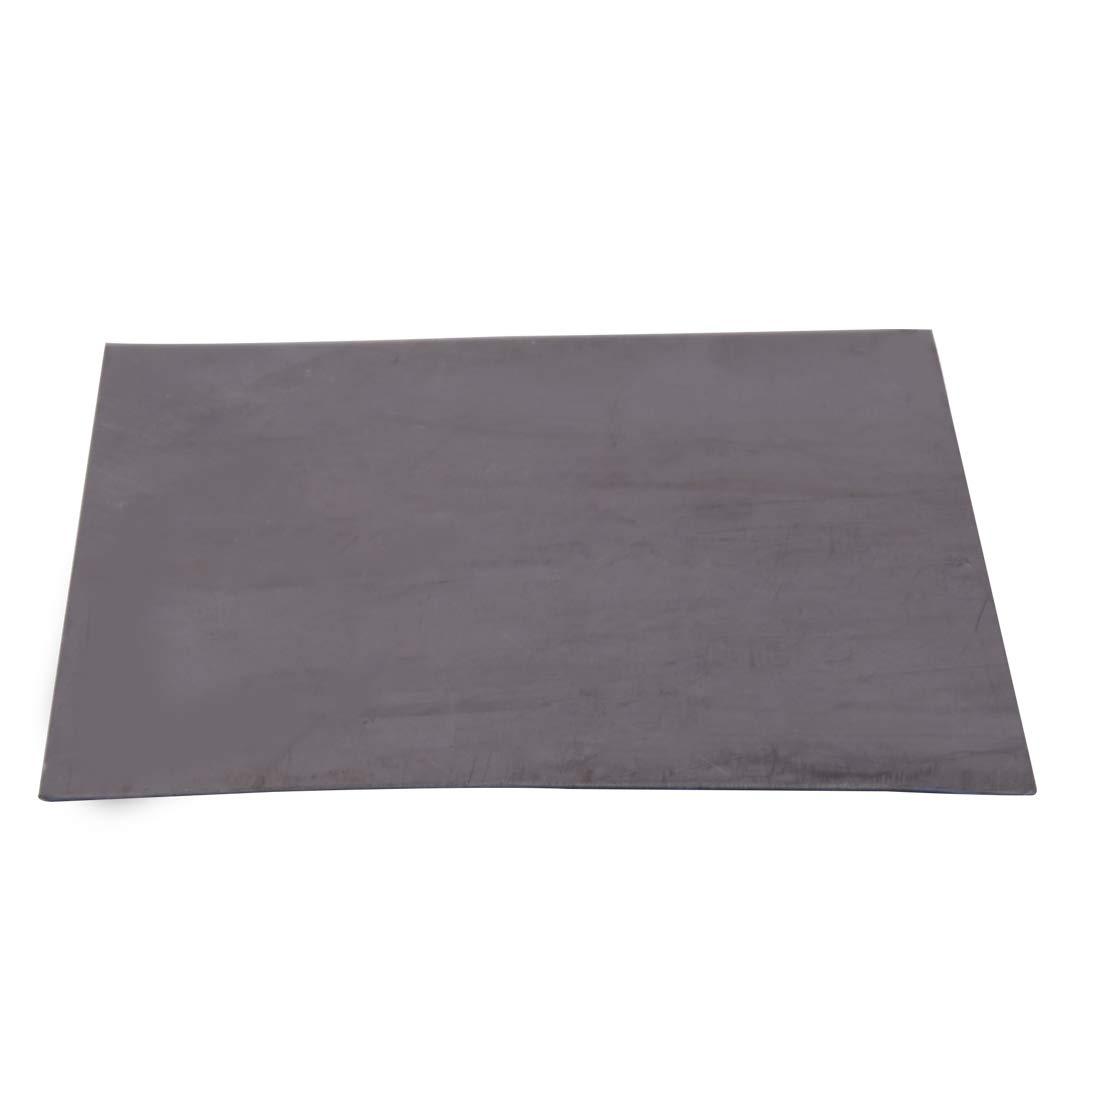 LETAOSK 0, 5 mm (0, 02 inch) Dicke Vierkant Titanfolie Blatt Ti Dü nne Platte Material 99, 8% Reinheit Metallbearbeitung Liefert